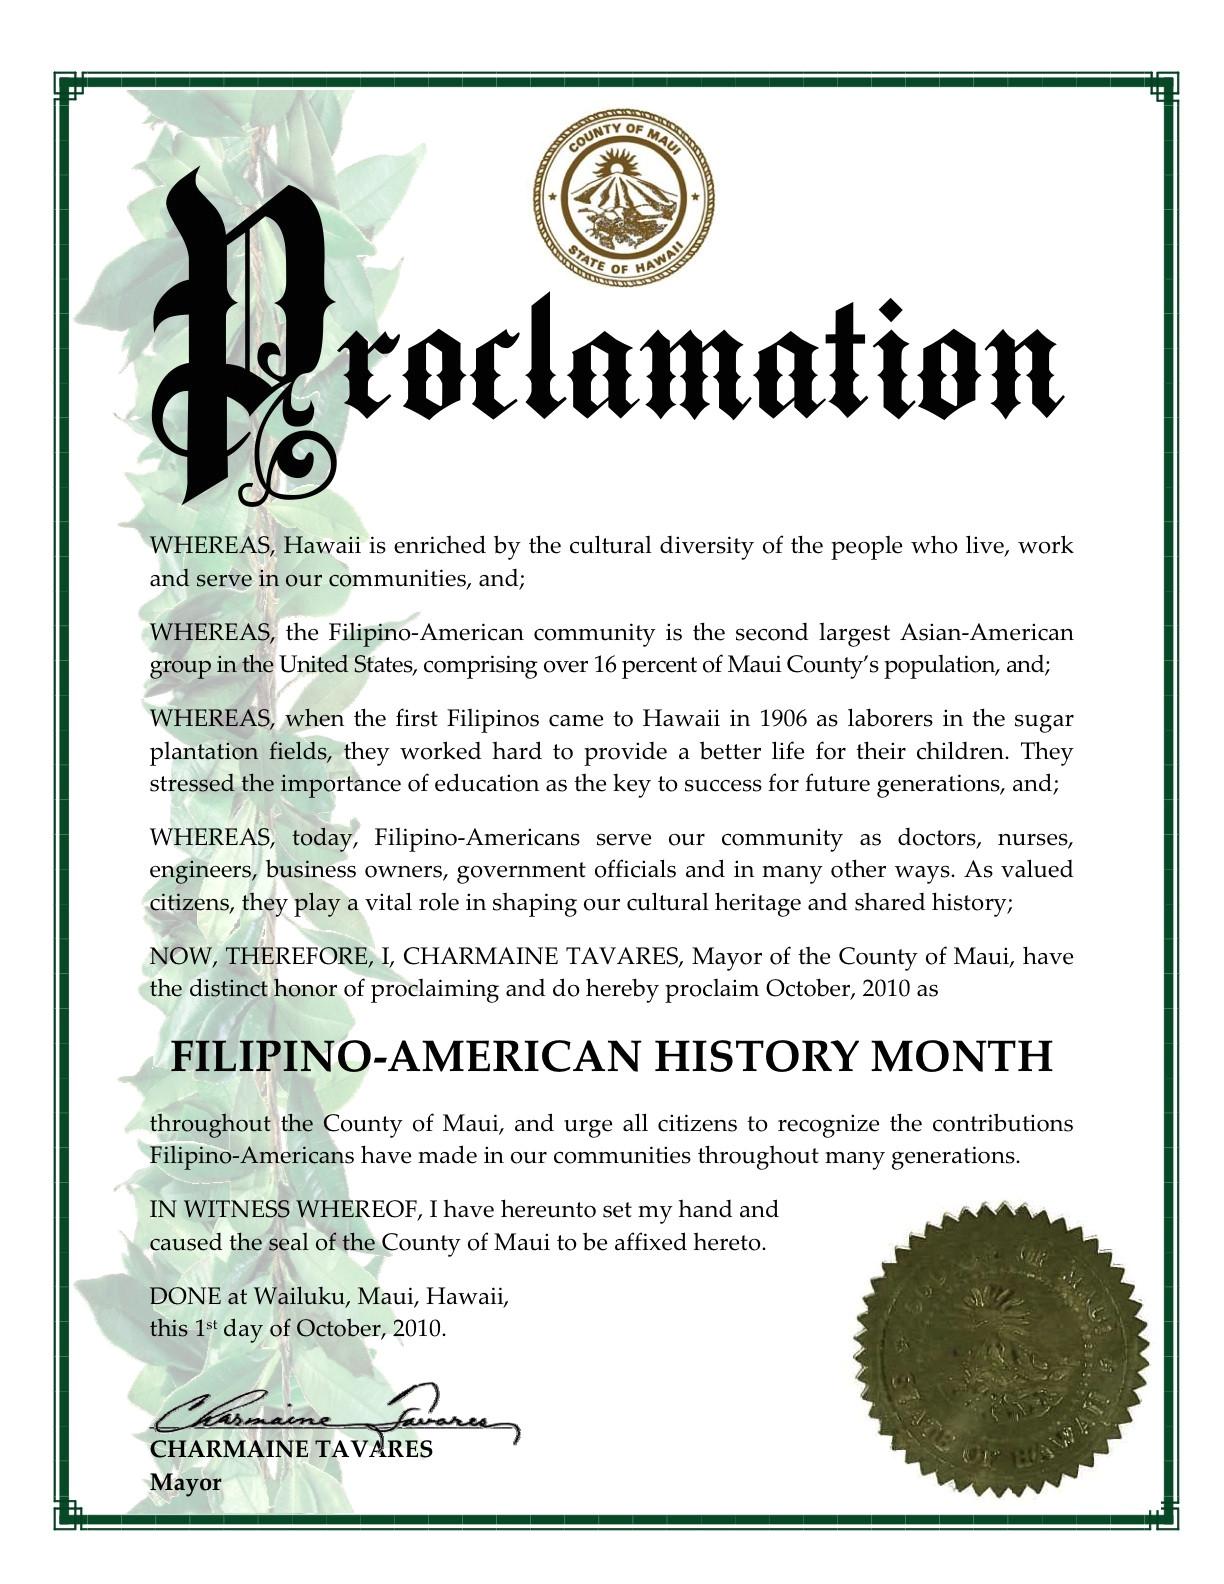 Proclamation Templates Proclamation Template Honoring someone Proclamation